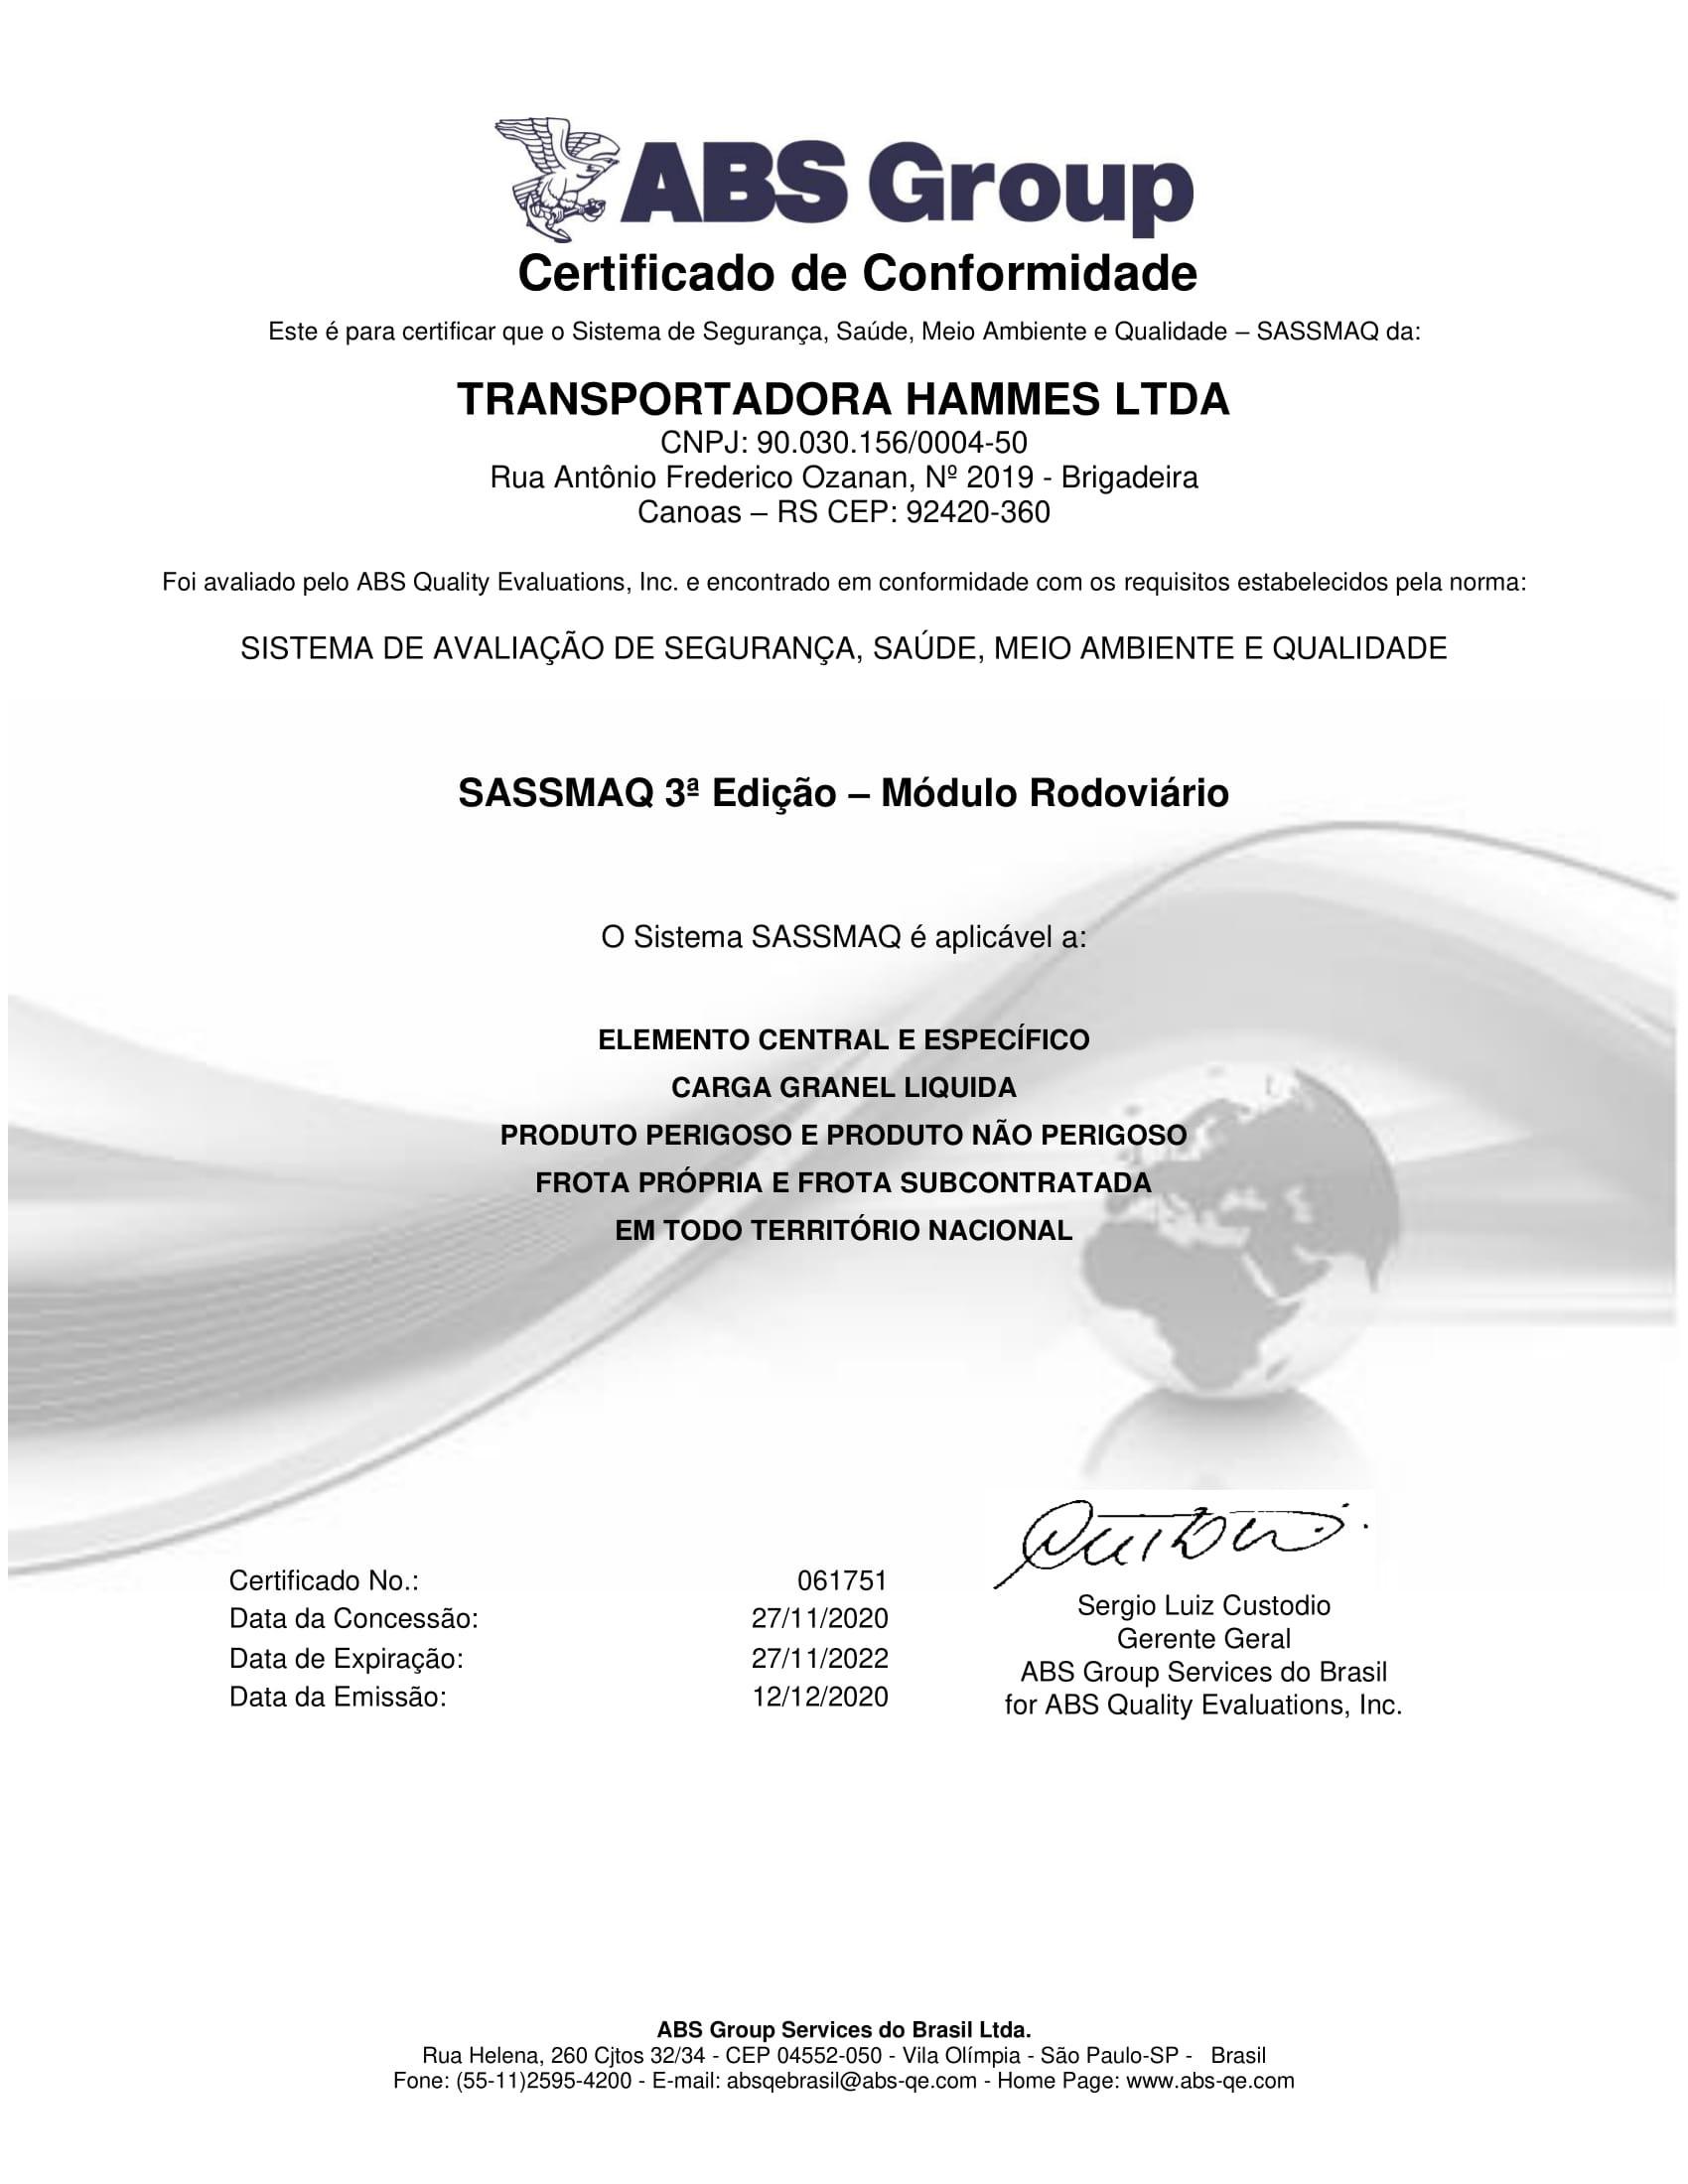 061751-Certificate-12DEC2020-Canoas-RS-1